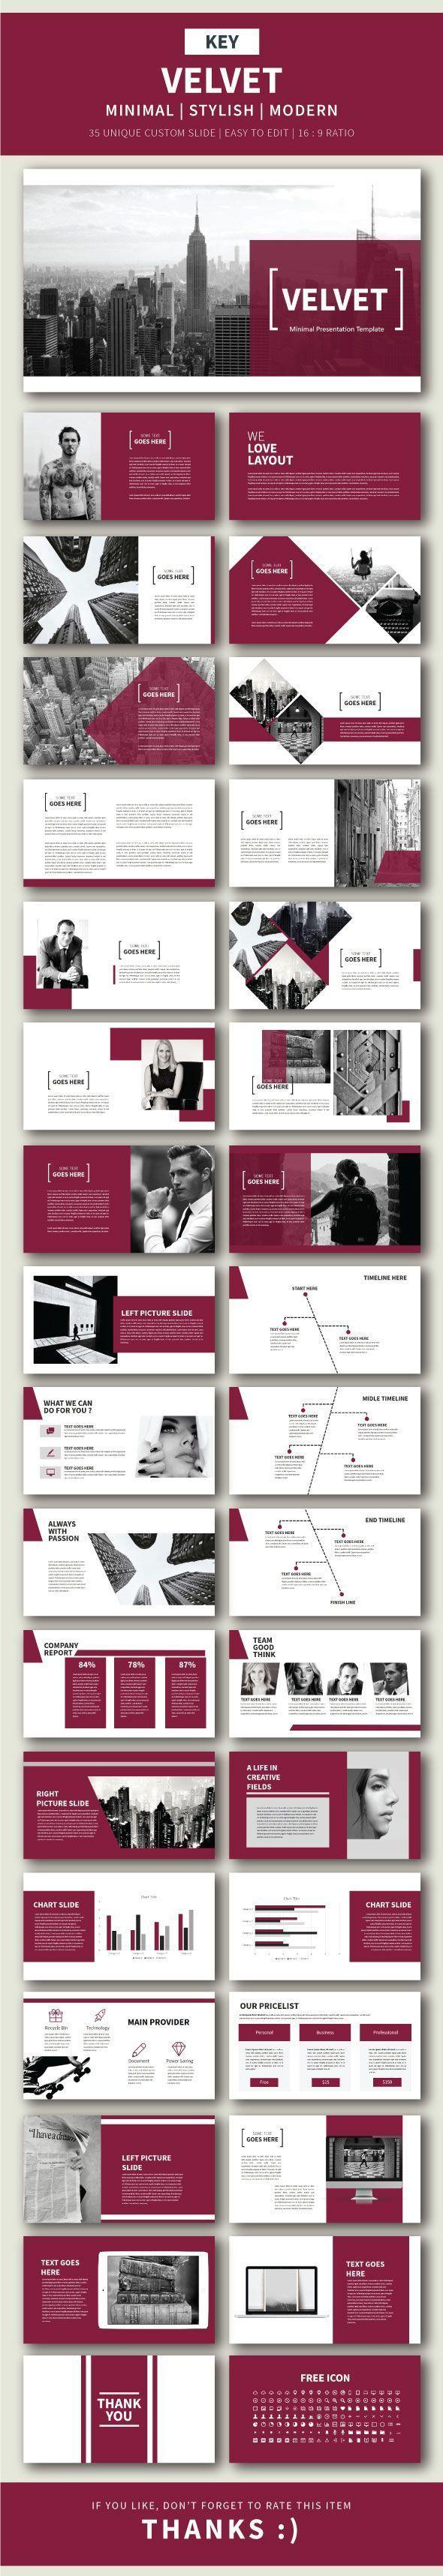 Velvet Keynote Presentation Template - Finance Keynote Templates ...